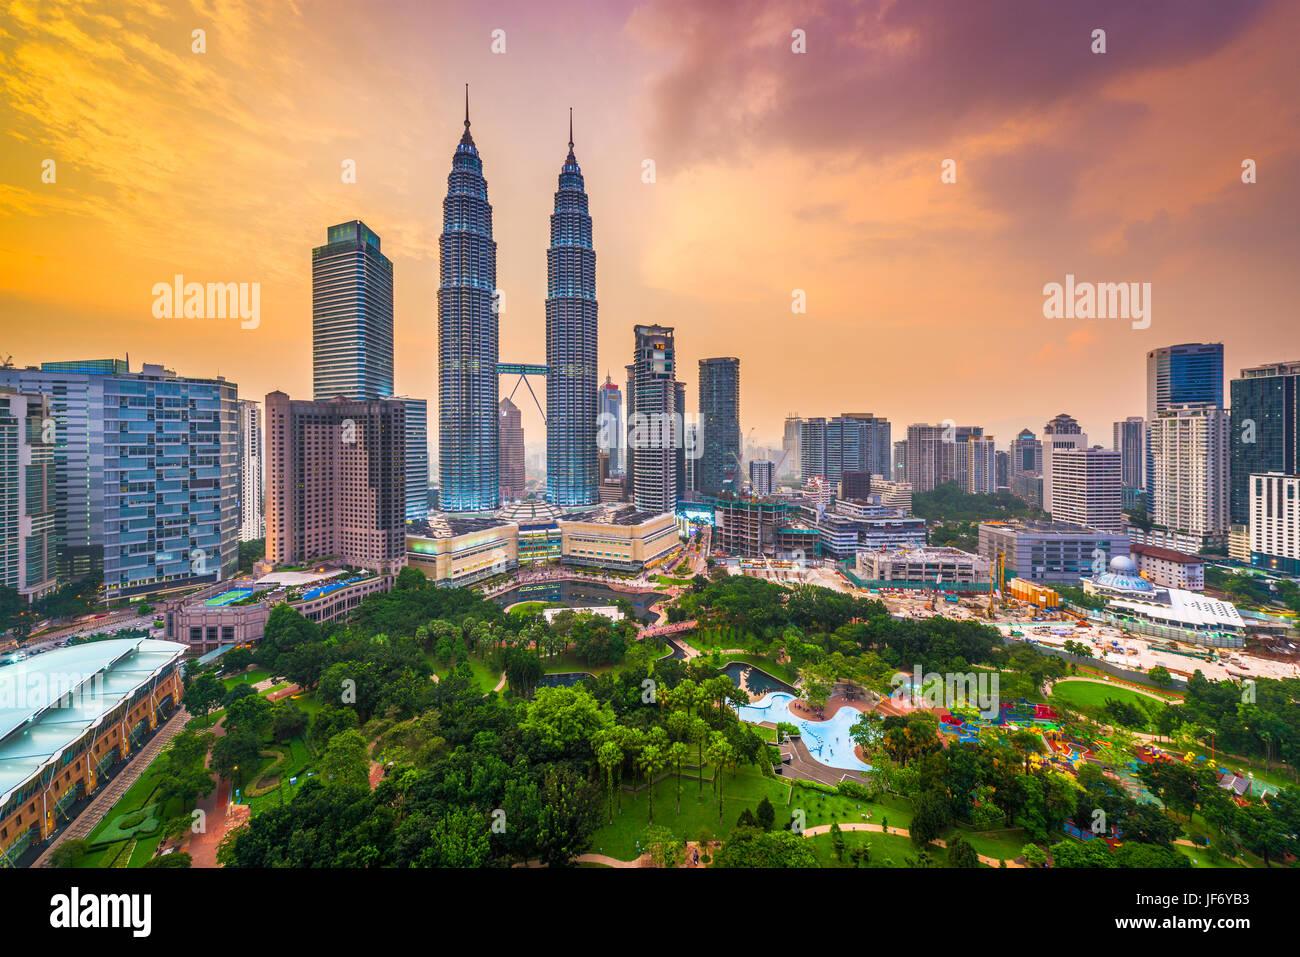 Kuala Lumpur, Malasia park y el horizonte. Imagen De Stock